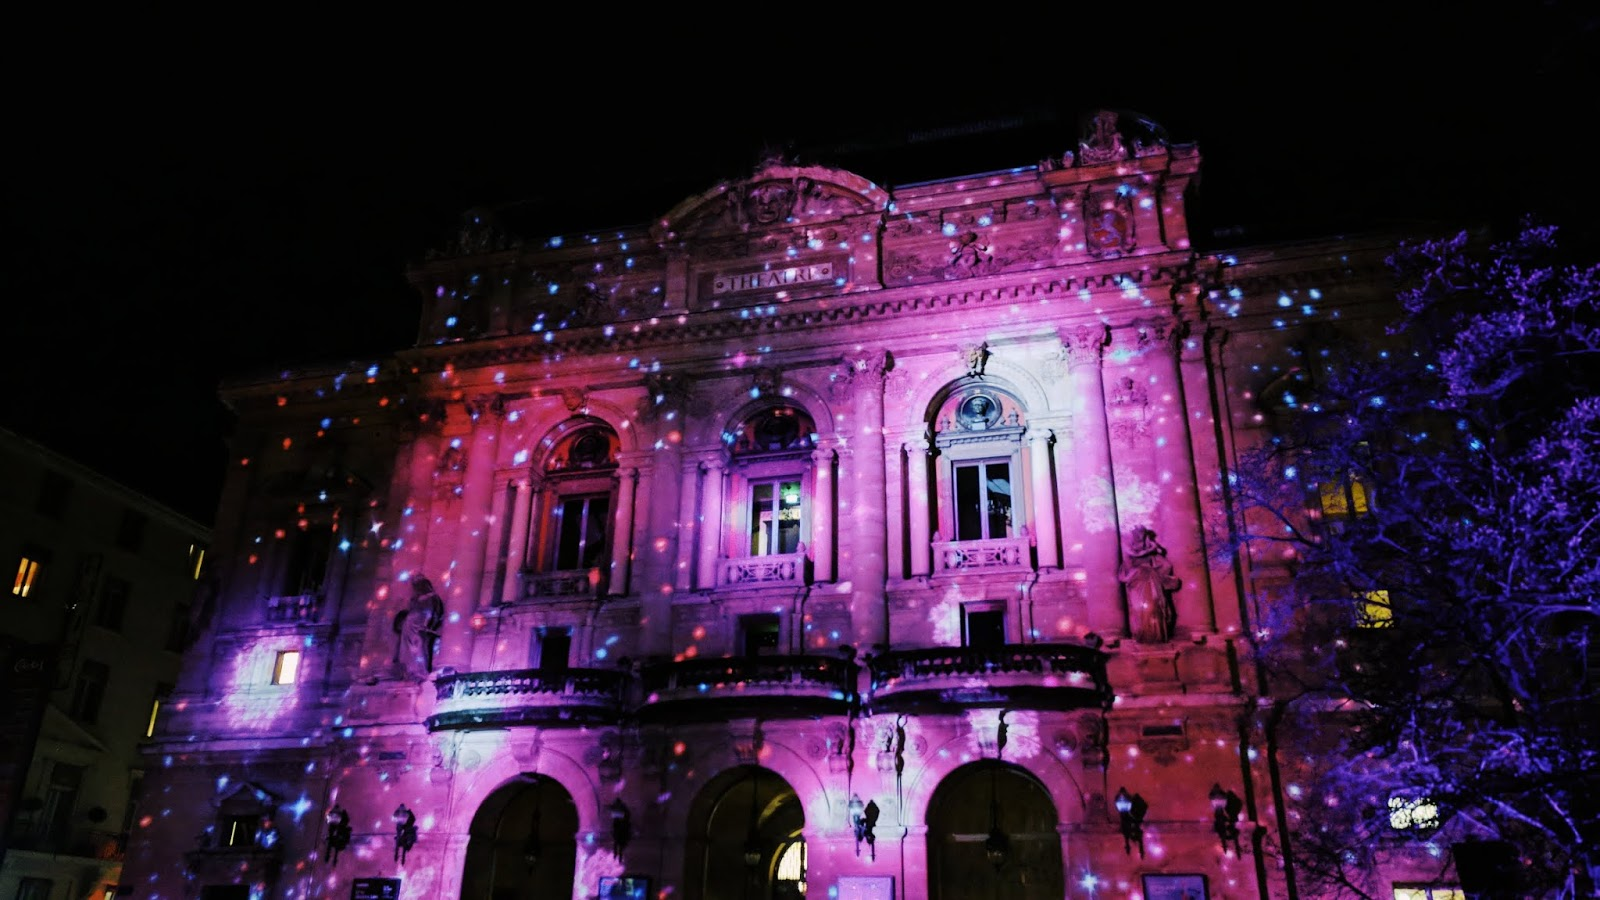 lyon hotel de ville festival of lights